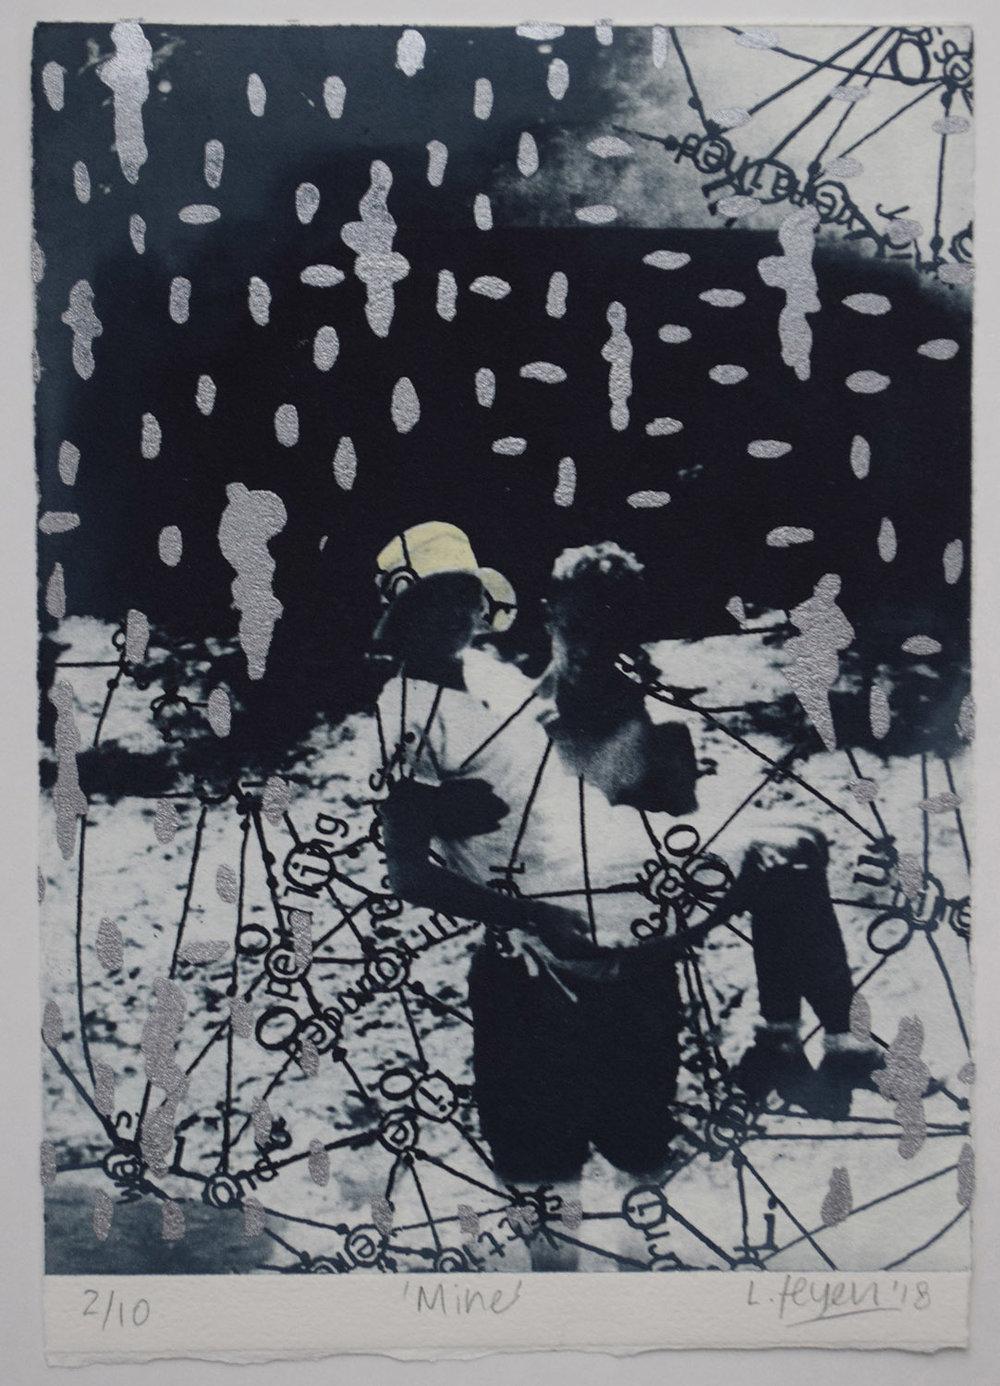 Mine2018 by Lisa Feyen